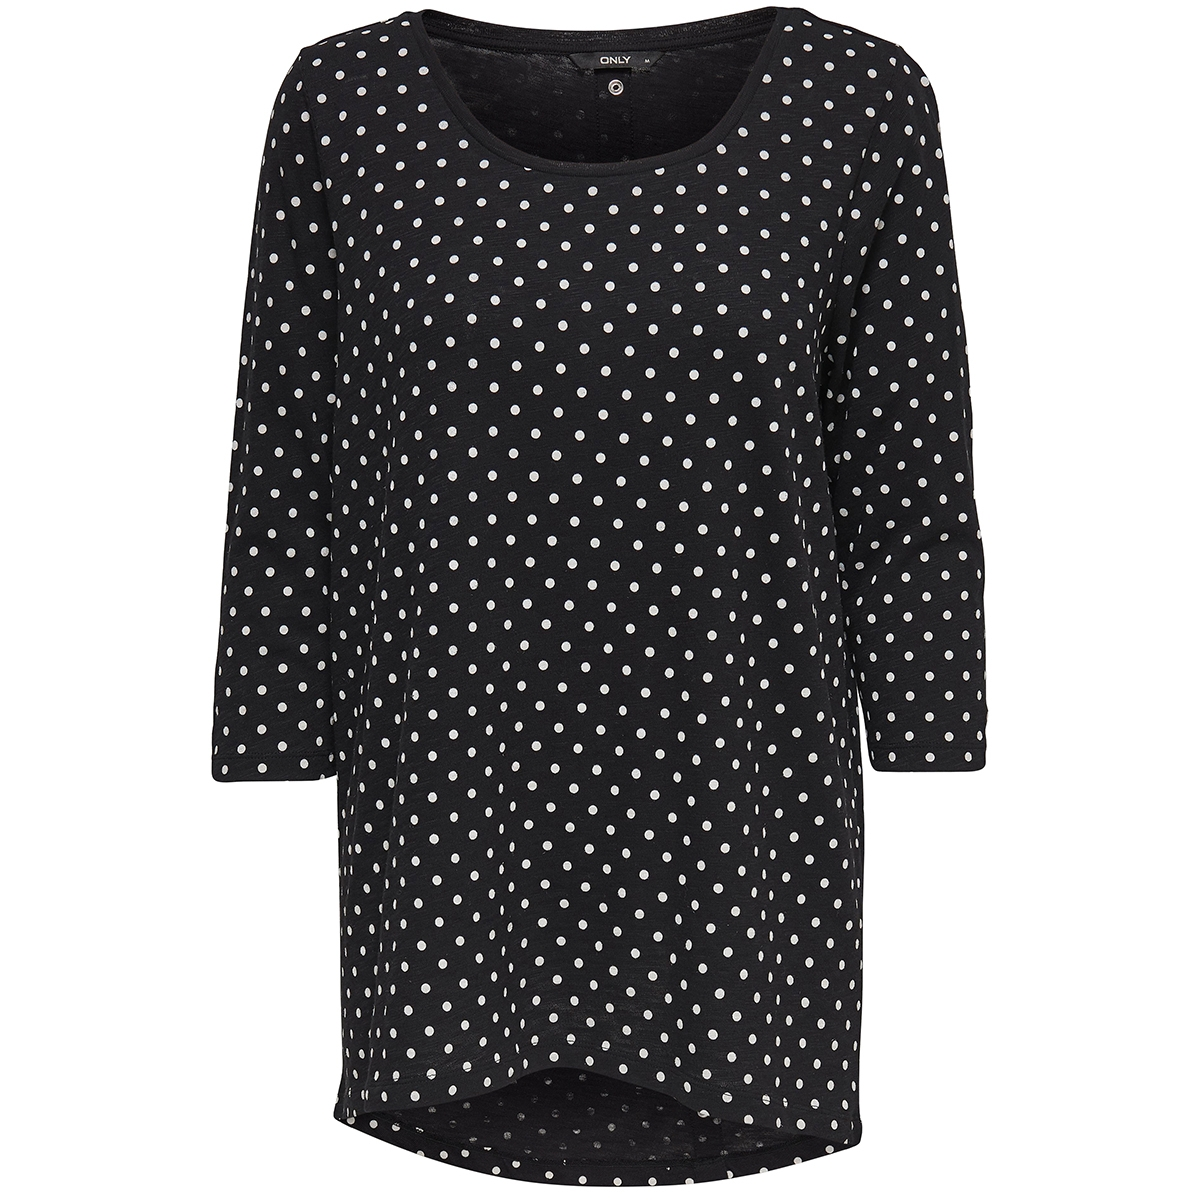 onlcasa 3/4 aop top jrs noos 15157699 only t-shirt black/ dots